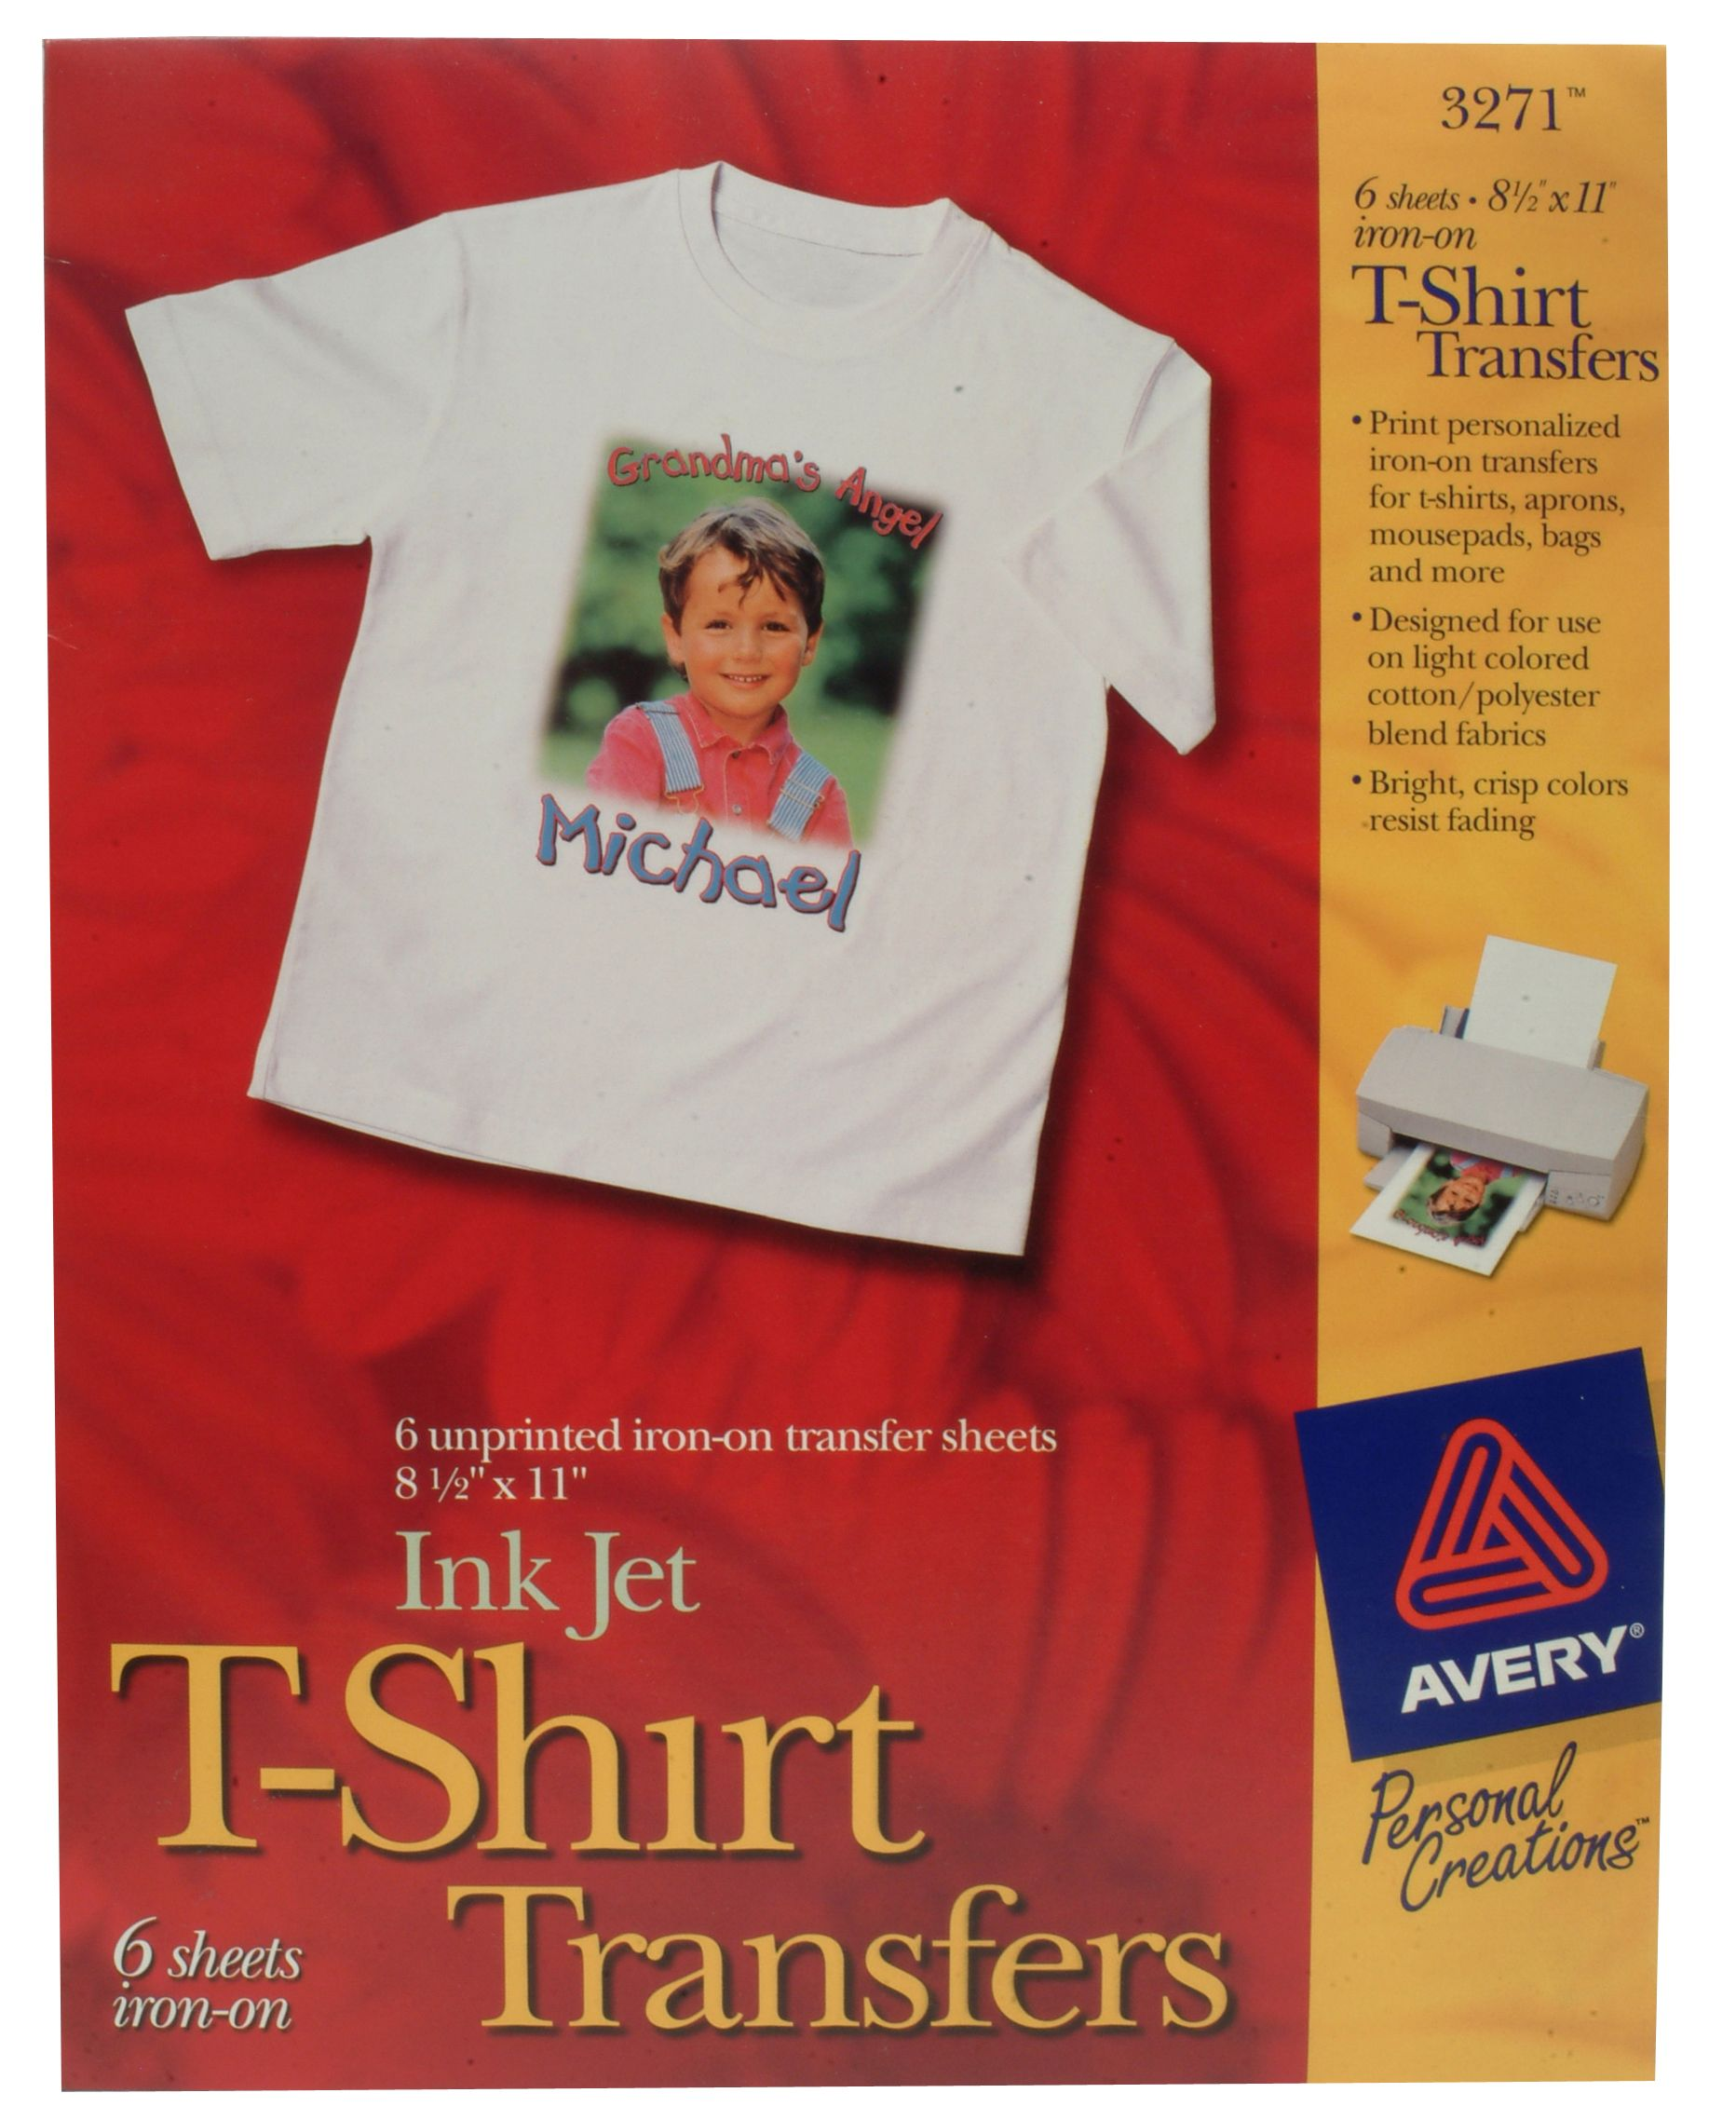 office max iron-on t-shirt inkjet transfers photo - 1